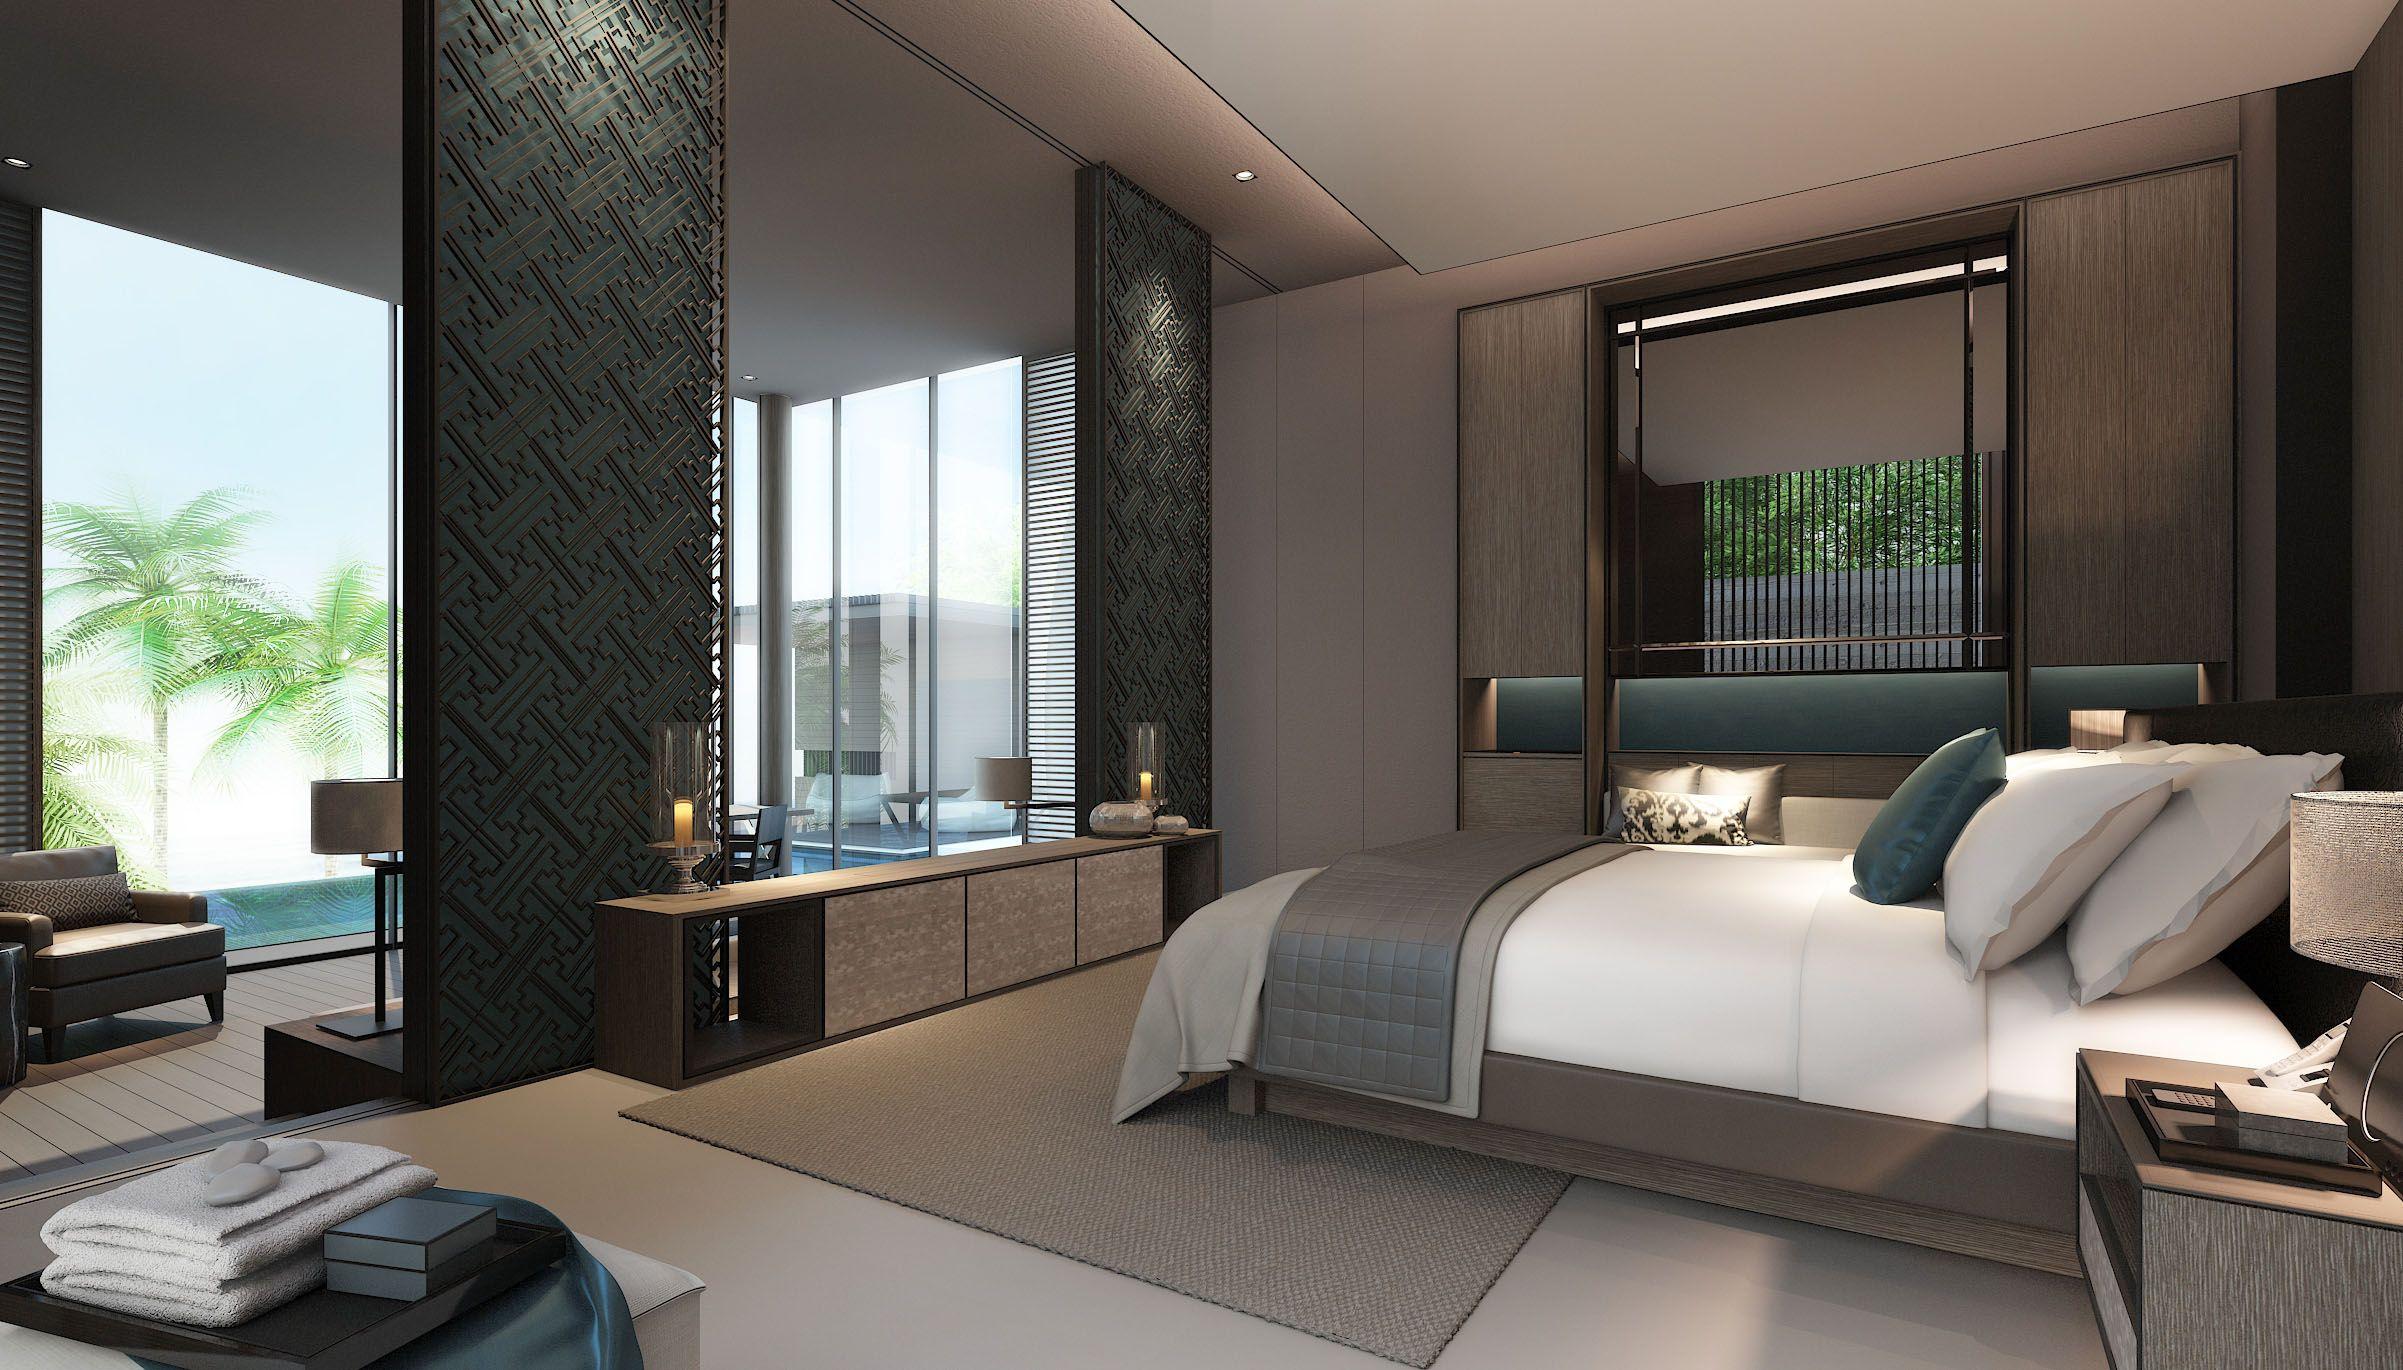 Scda Resort Hotel Development Bali Indonesia Guestroom